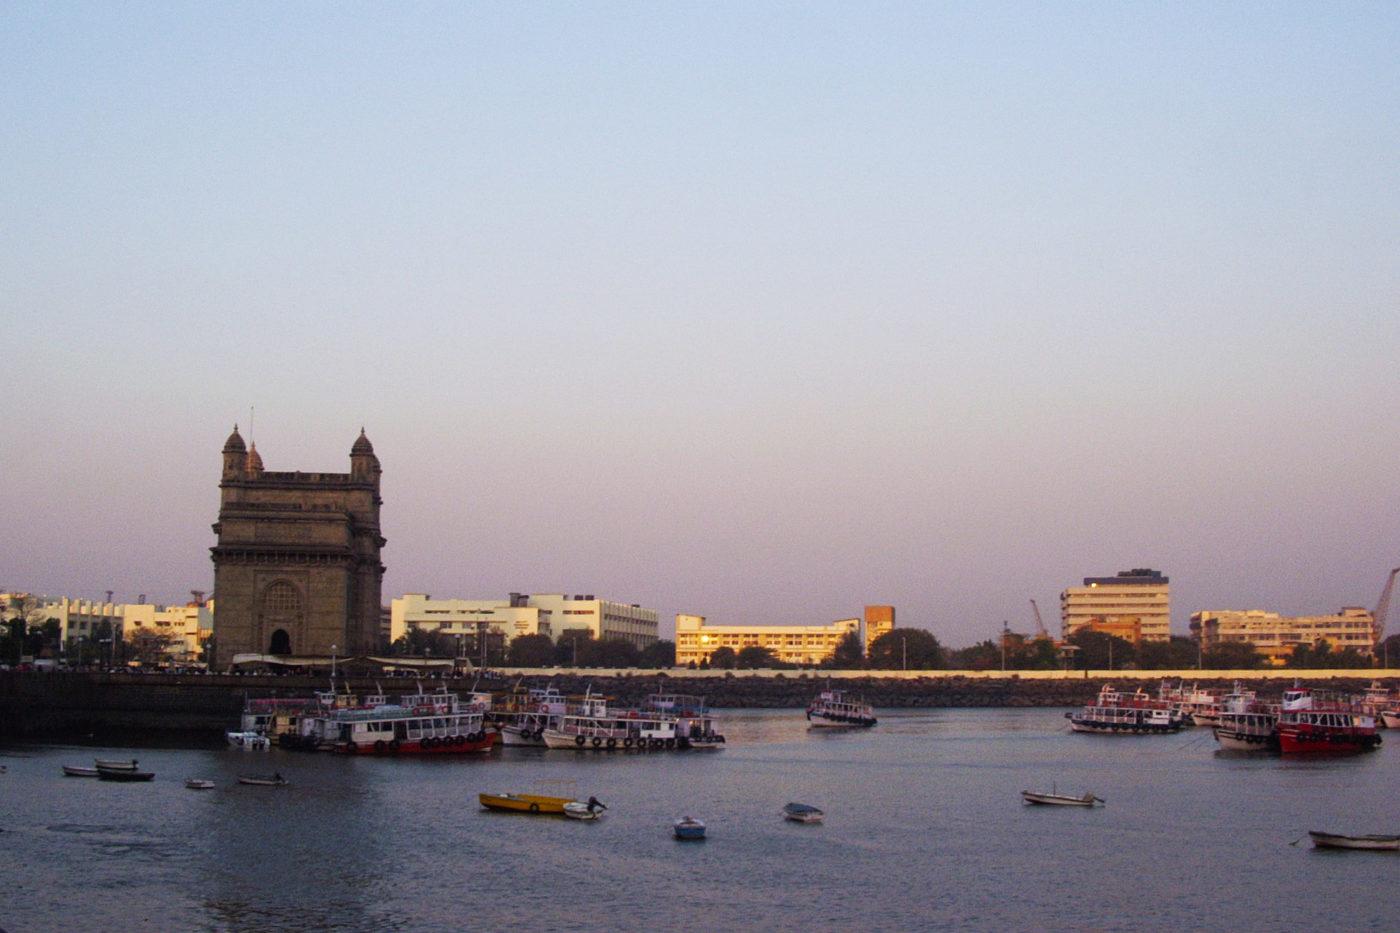 Gate of India Mumbai Goa India